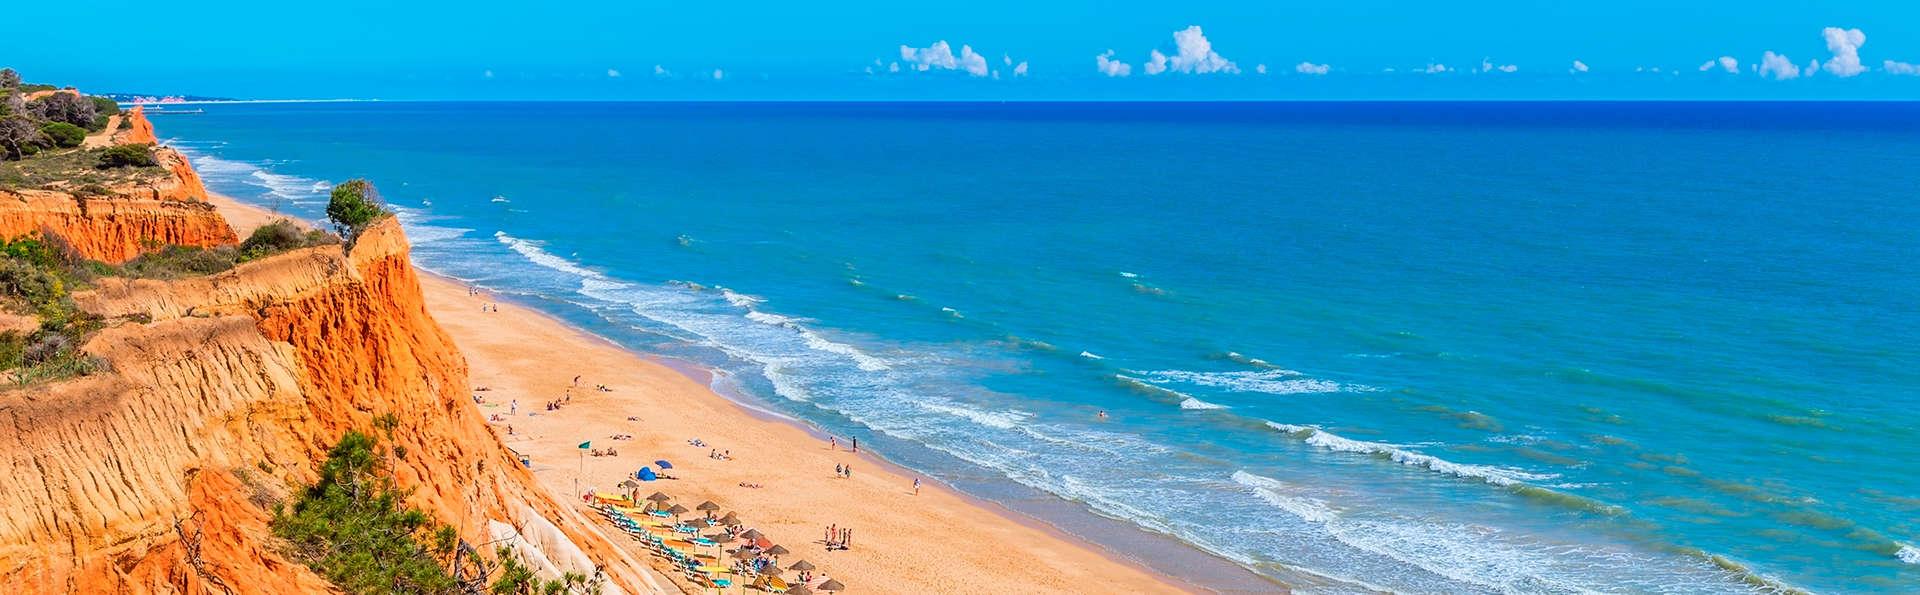 Aqua Pedra Dos Bicos Beach Hotel (Adults Only) - EDIT_destination2.jpg